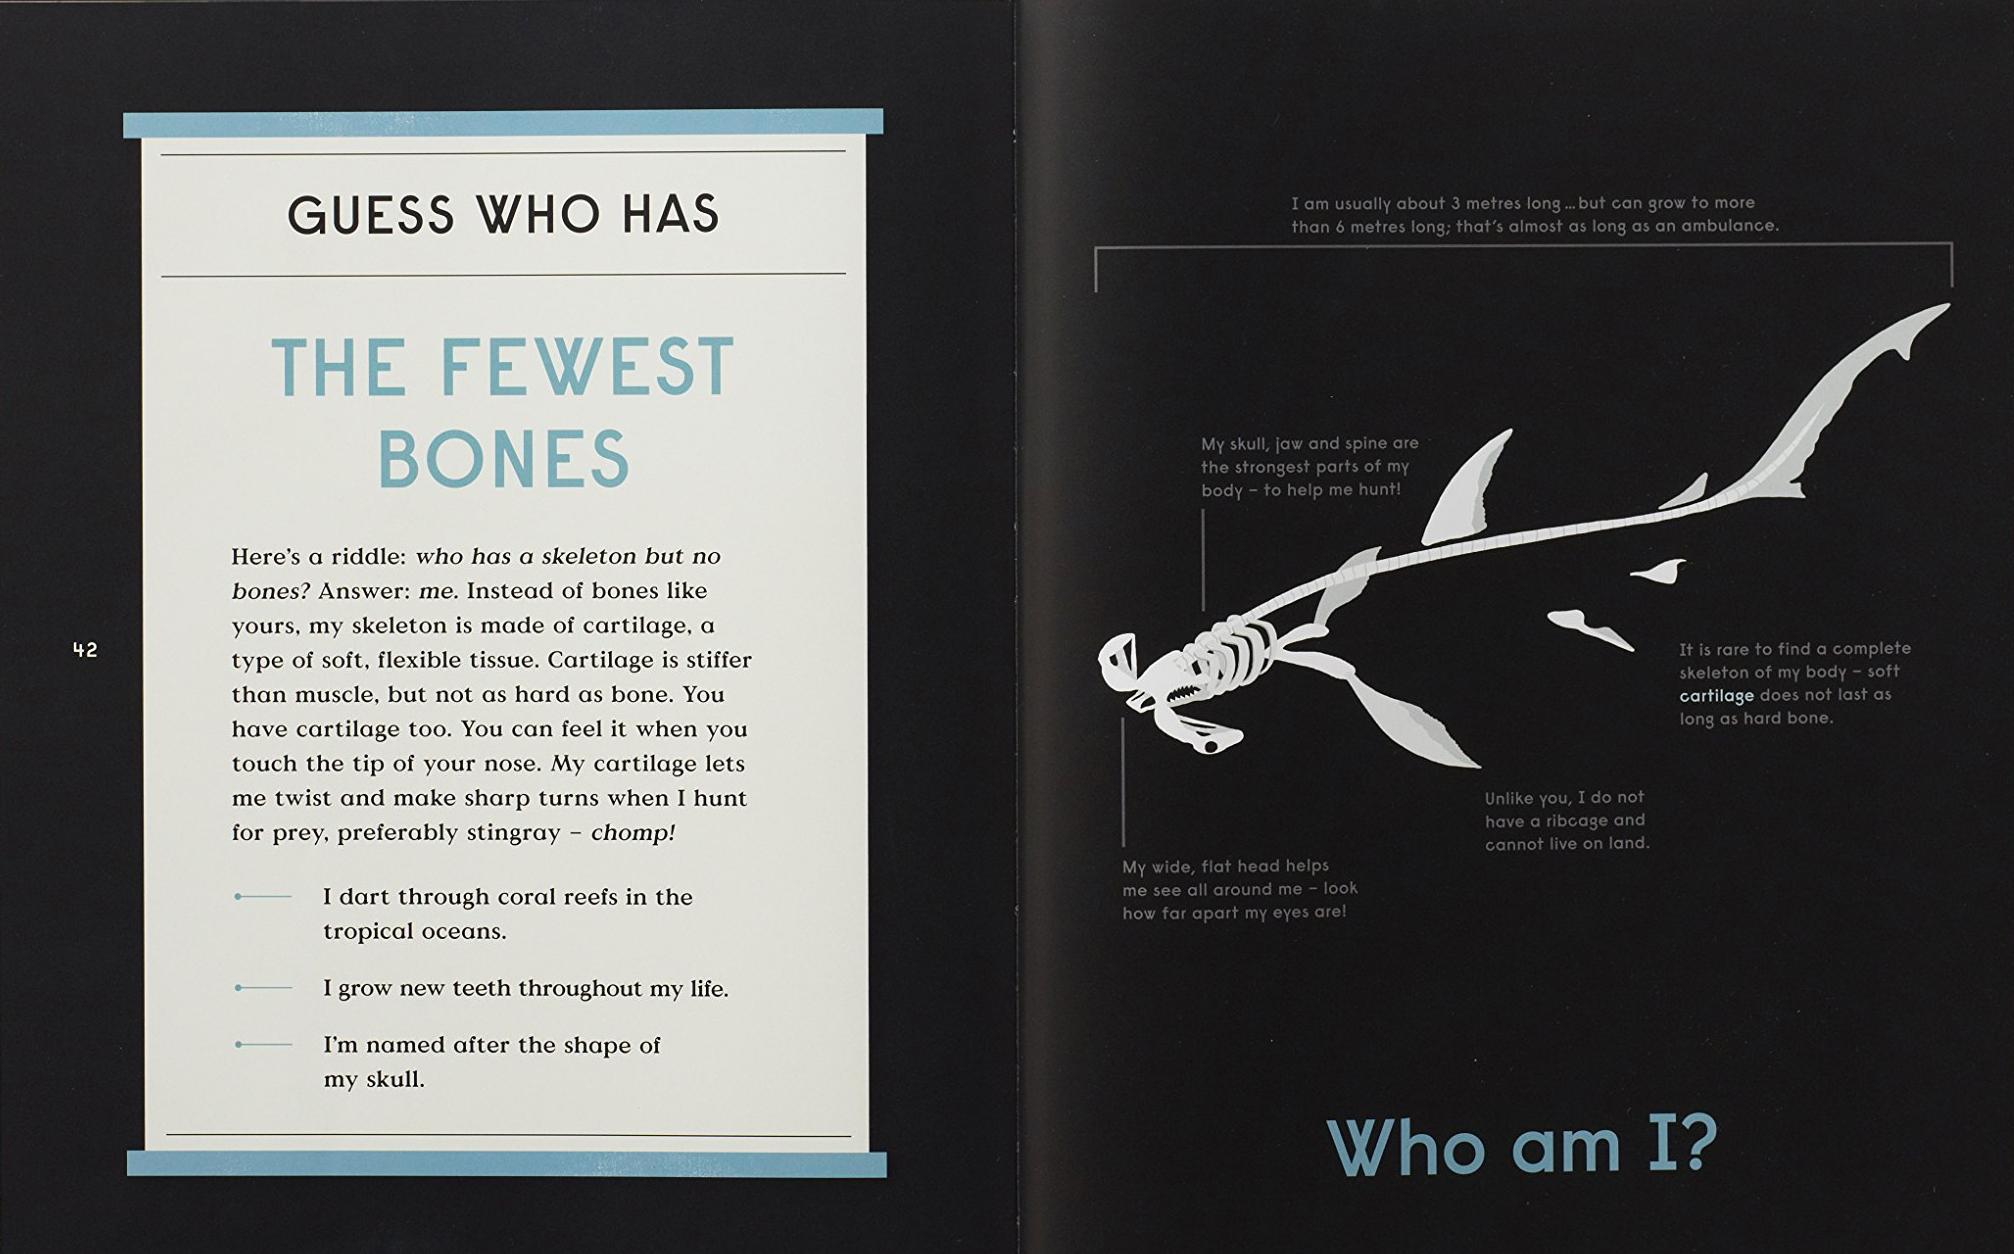 celebrate-picture-books-picture-book-review-book-of-bones-fewest-bon